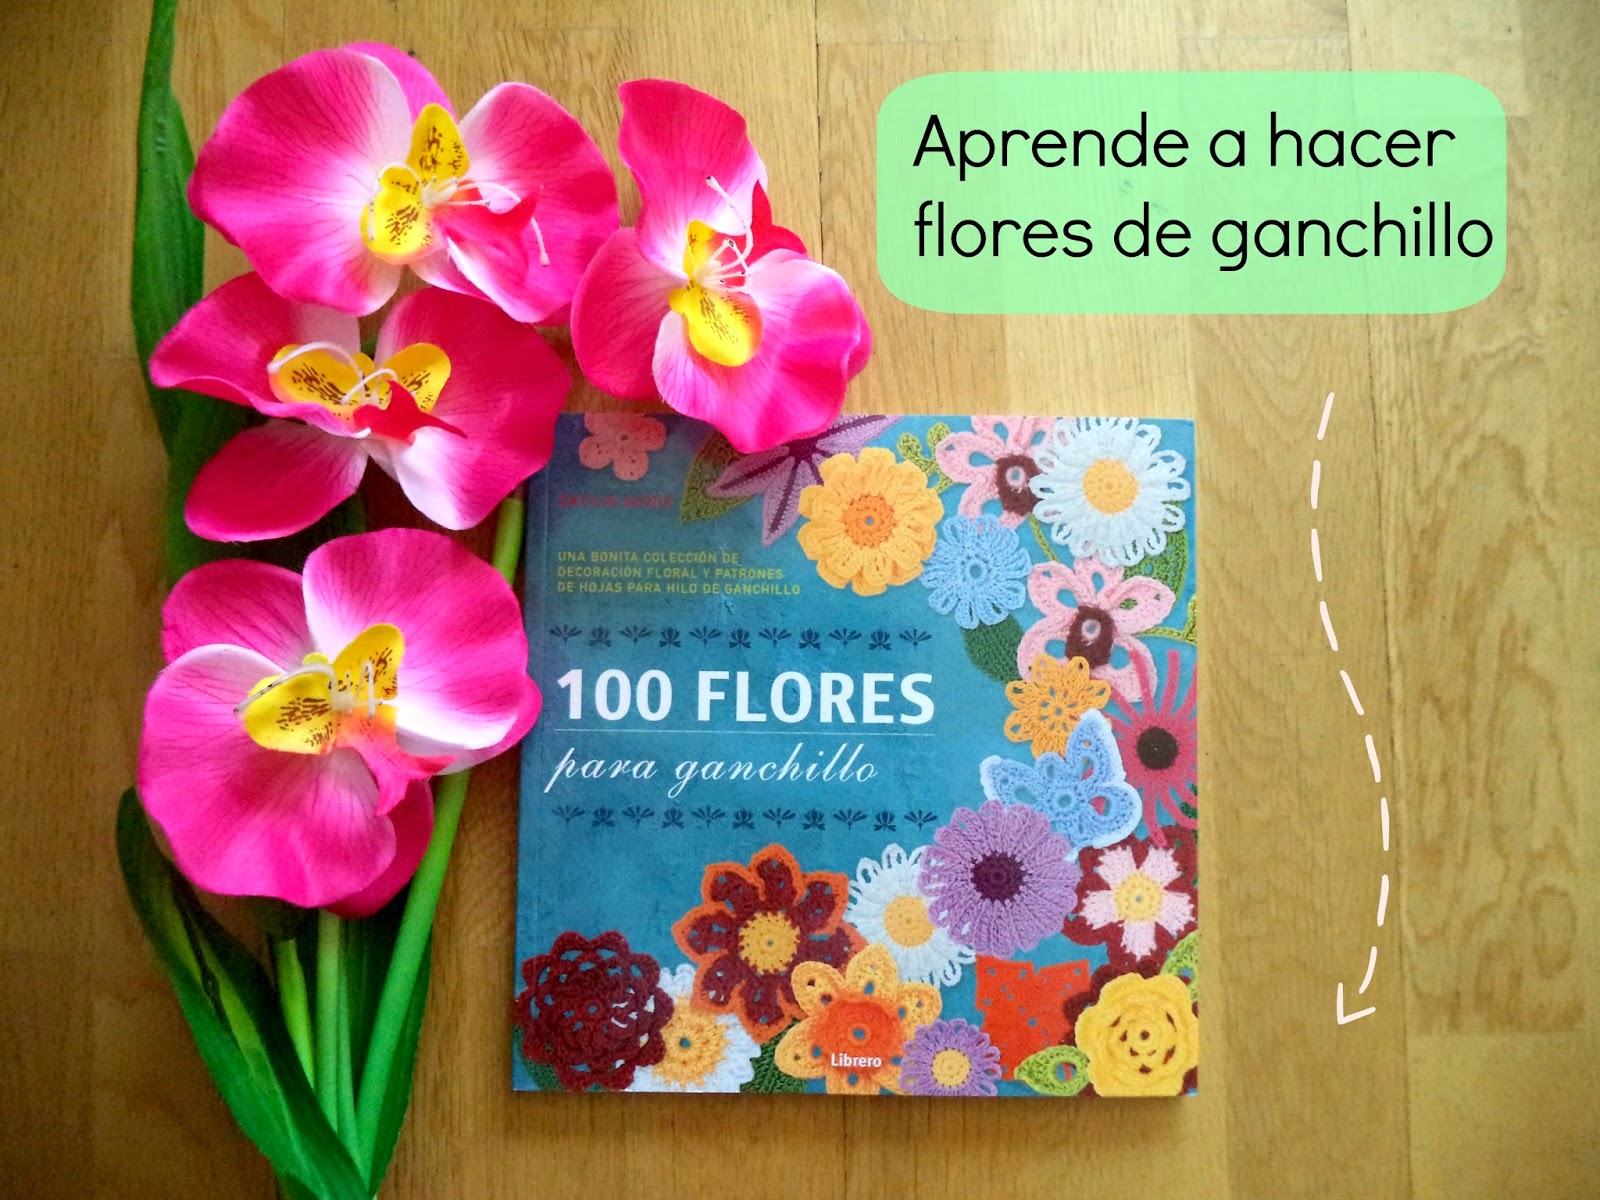 Happy Ganchillo Libros Top Para Ganchilleras Aprender A Hacer - Flores-ganchillo